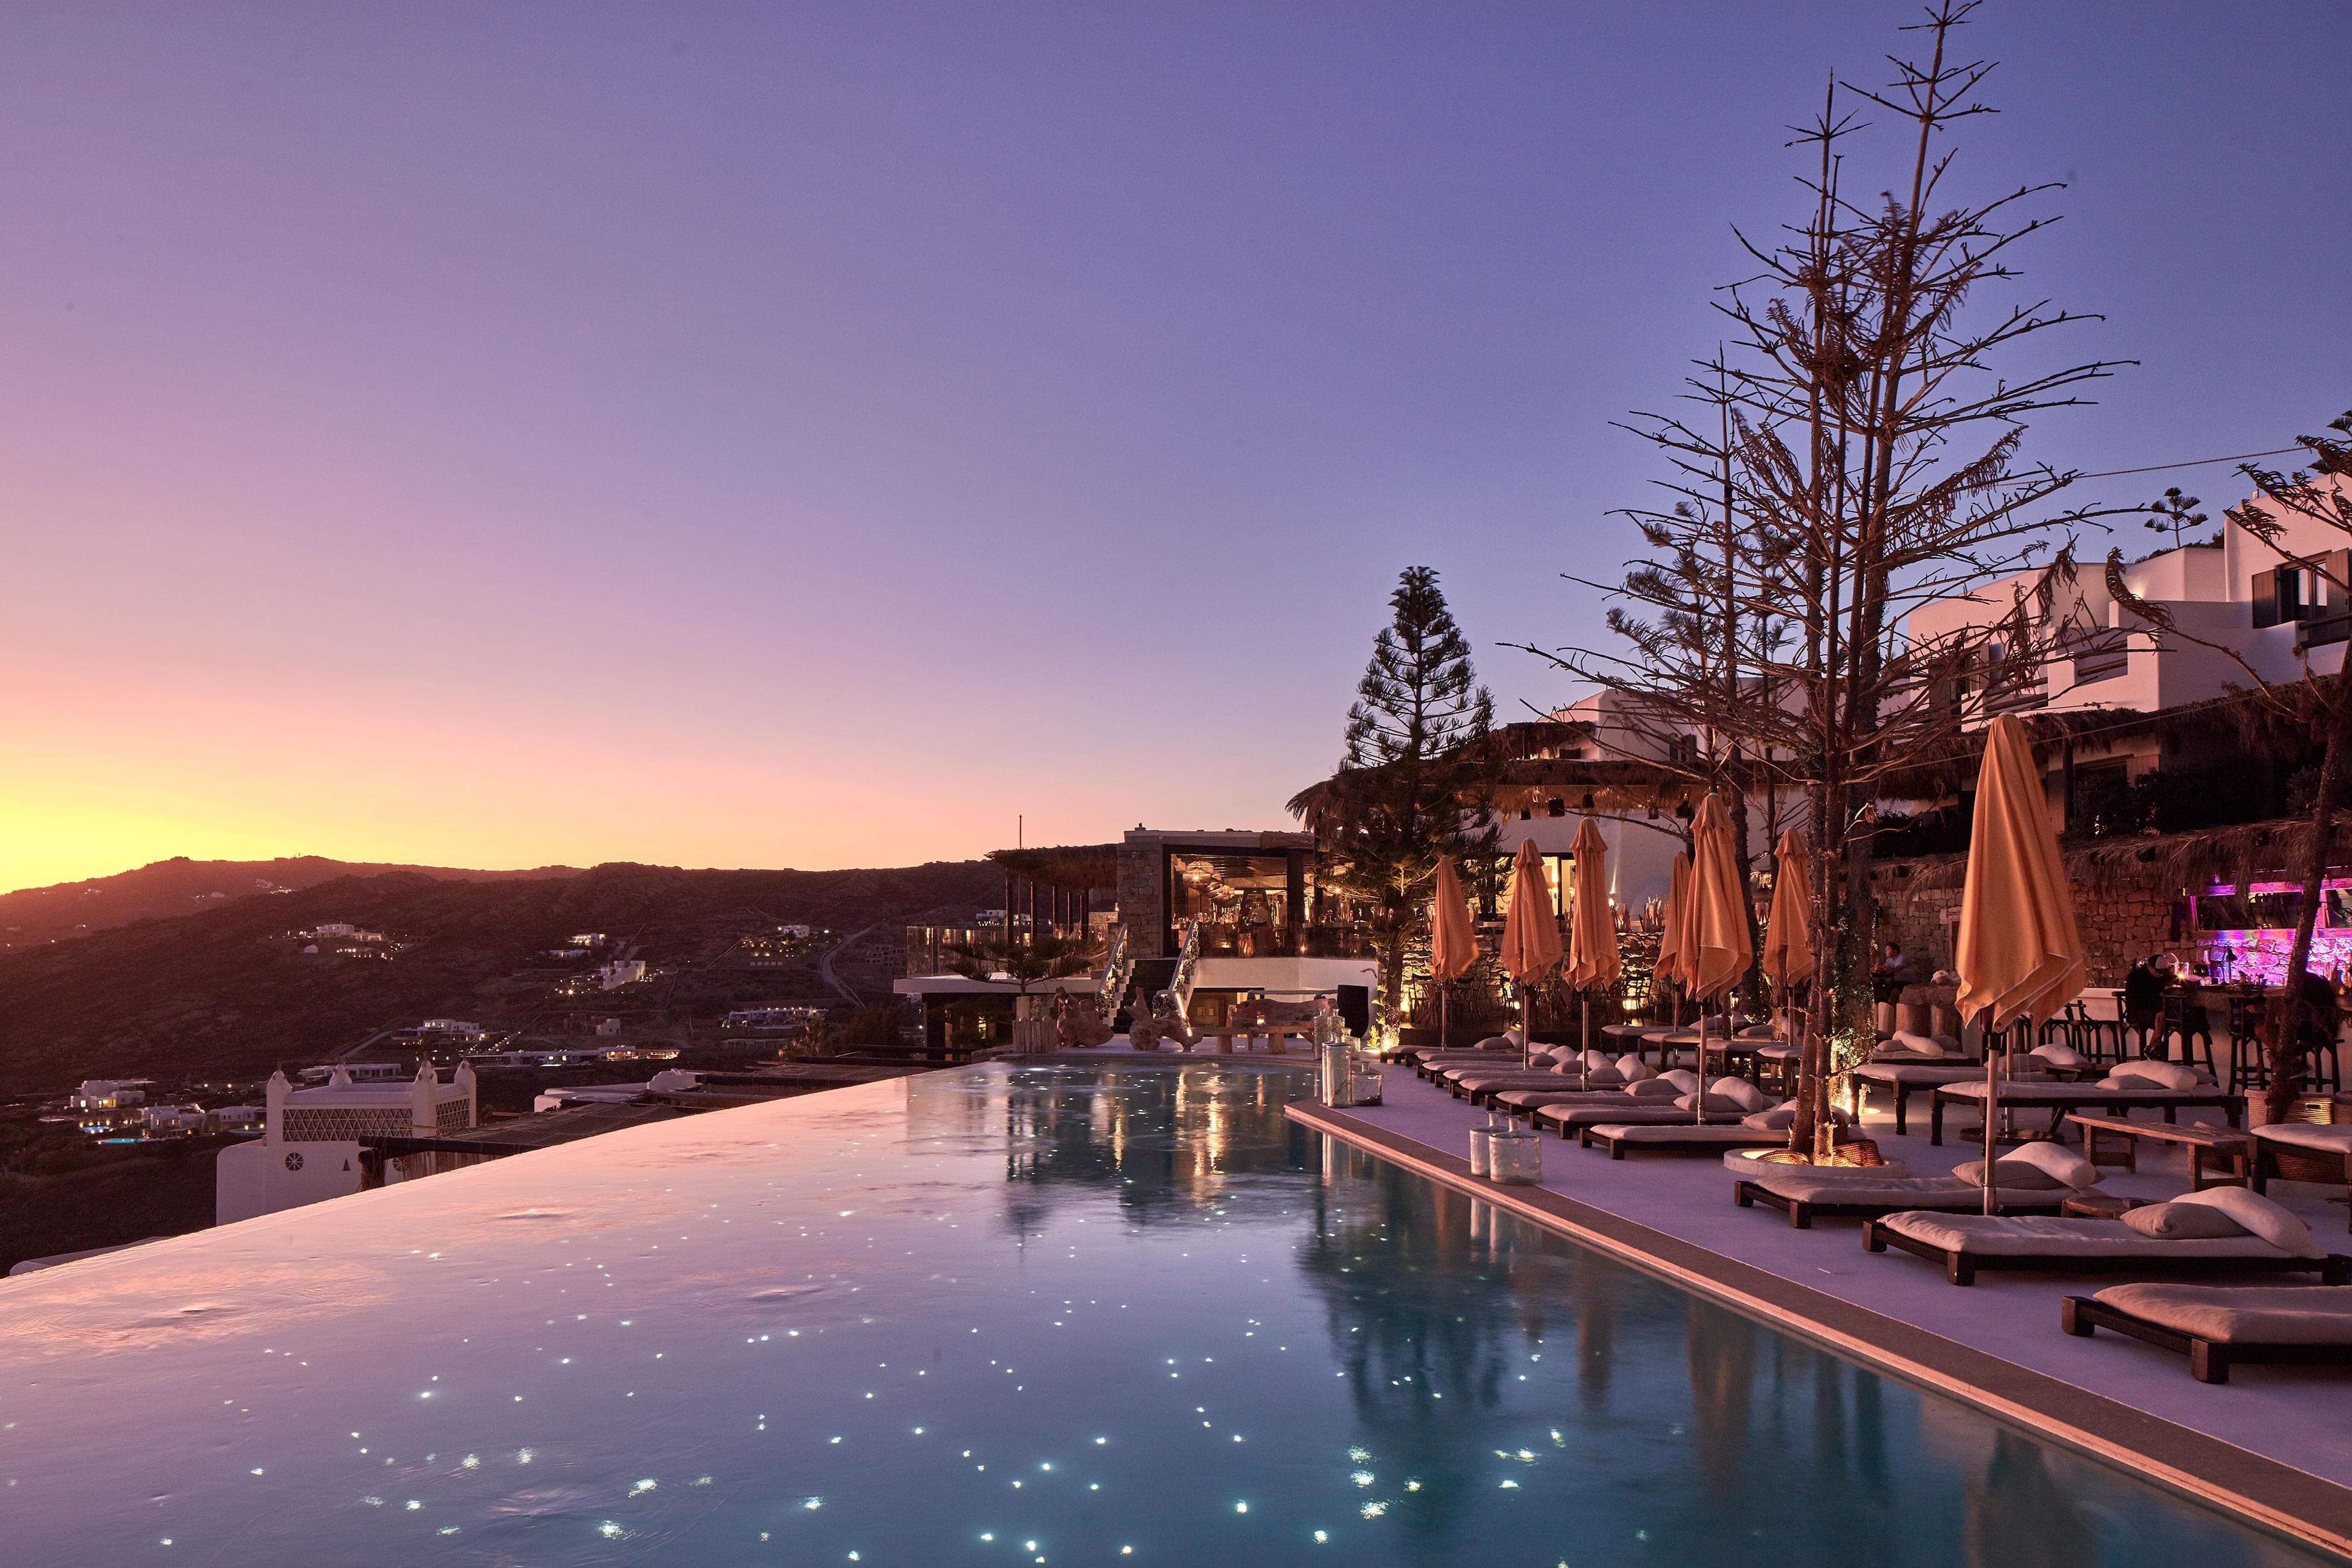 The Myconian Utopia pool at night